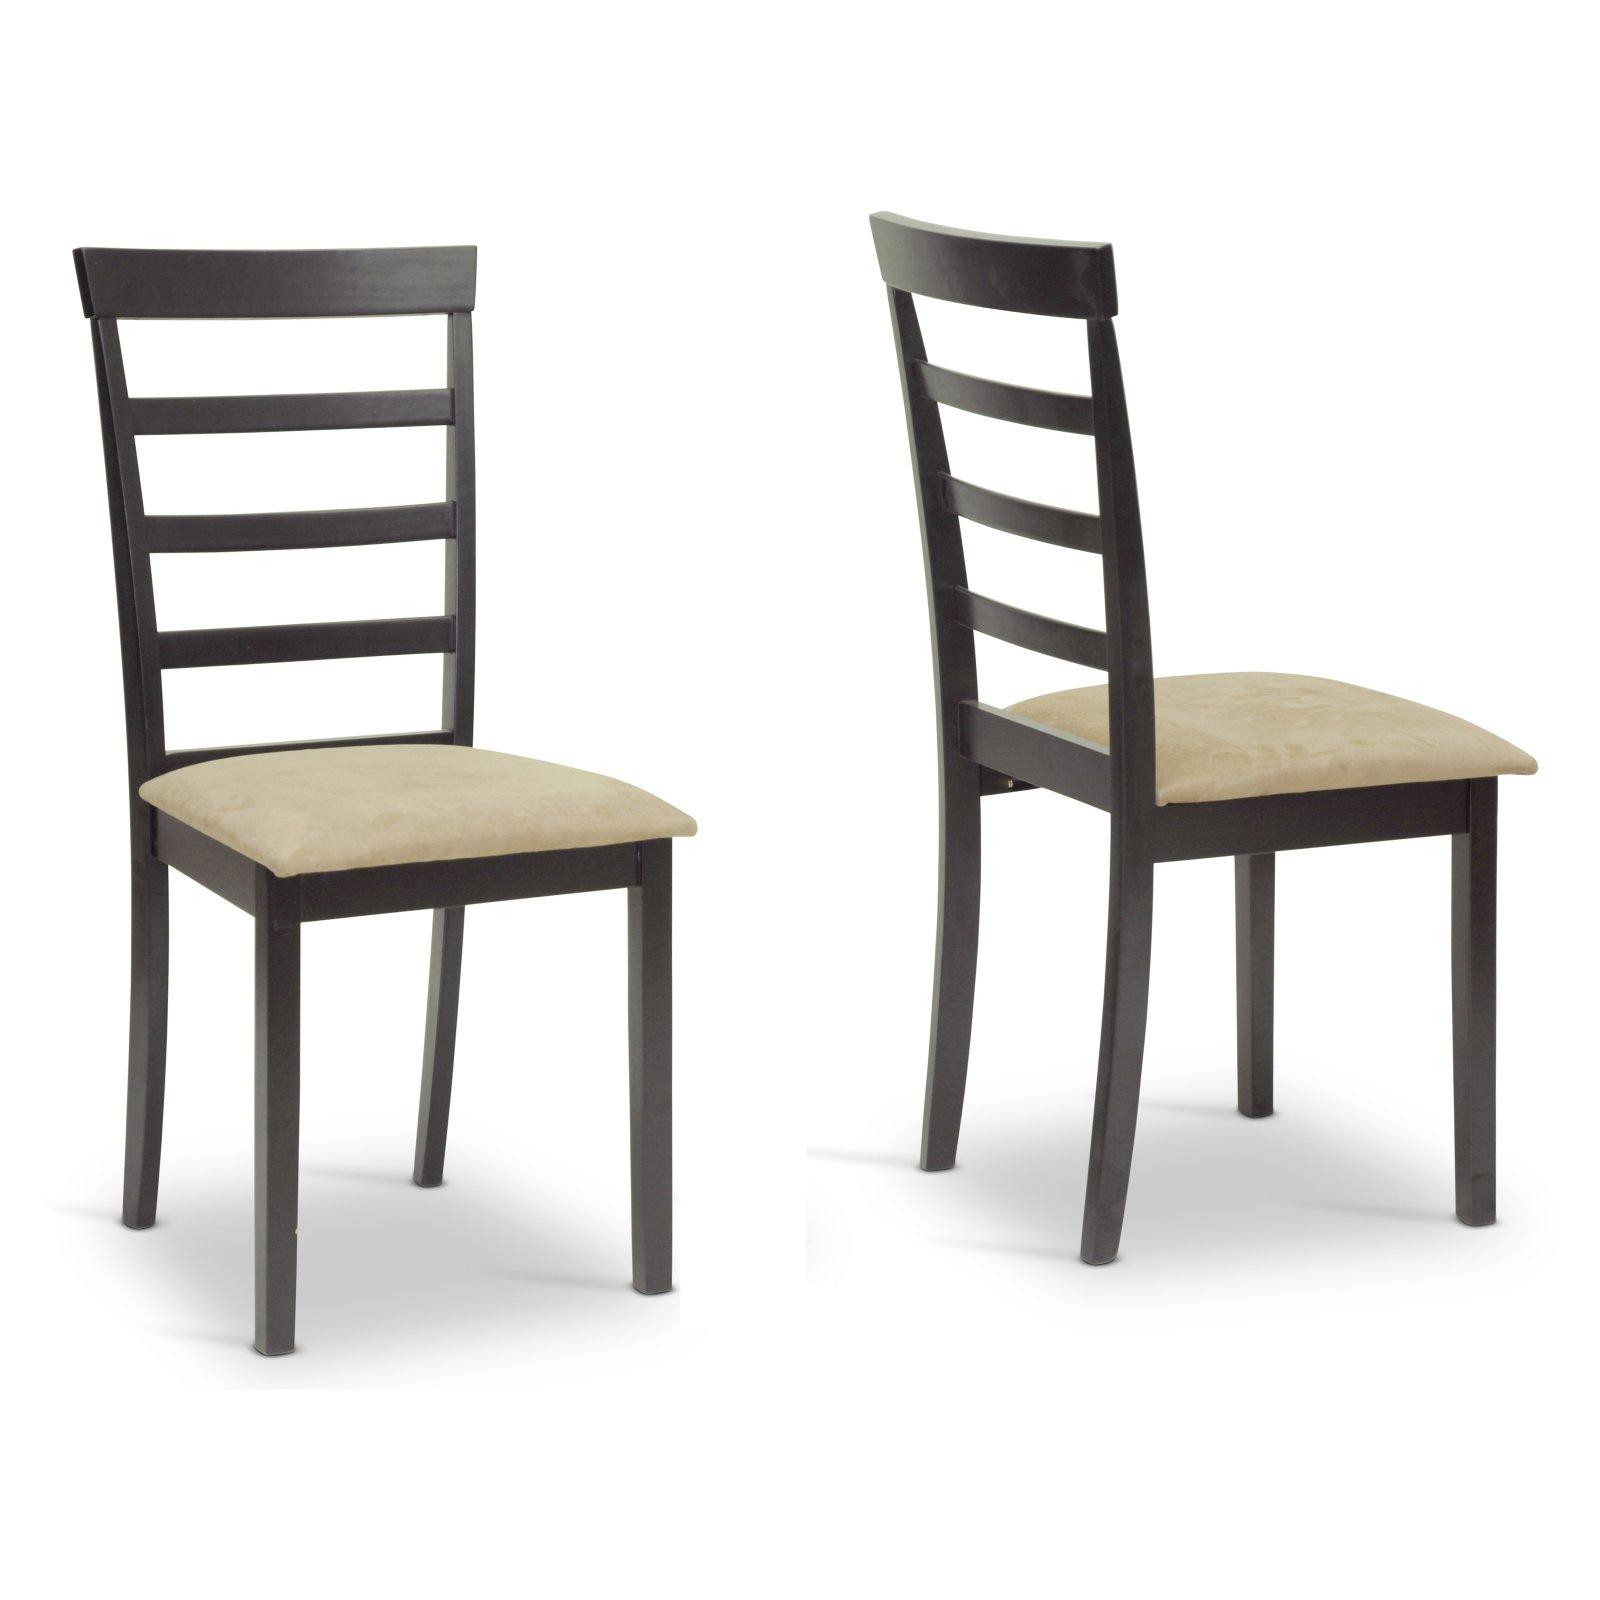 Baxton Studio Jet Sun Dining Chair - Set of 2